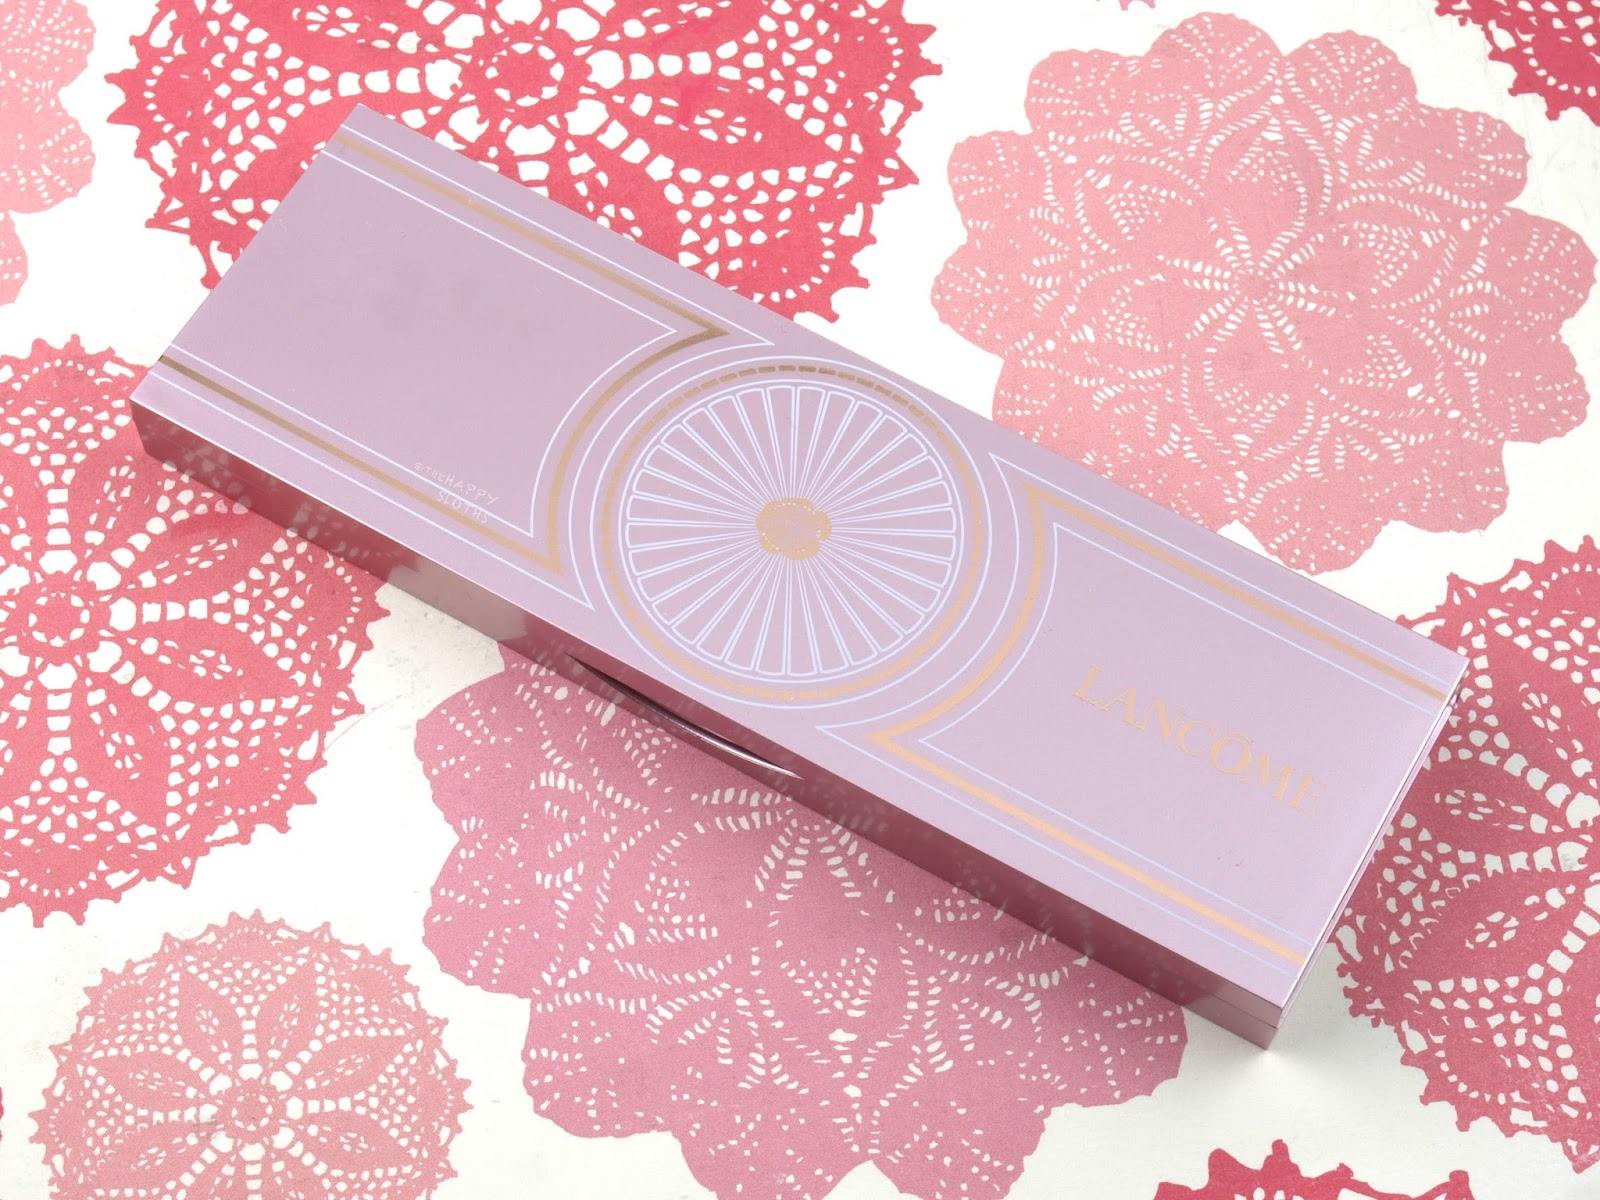 Lancome Spring 2017 La Palette La Rose Review and Swatches